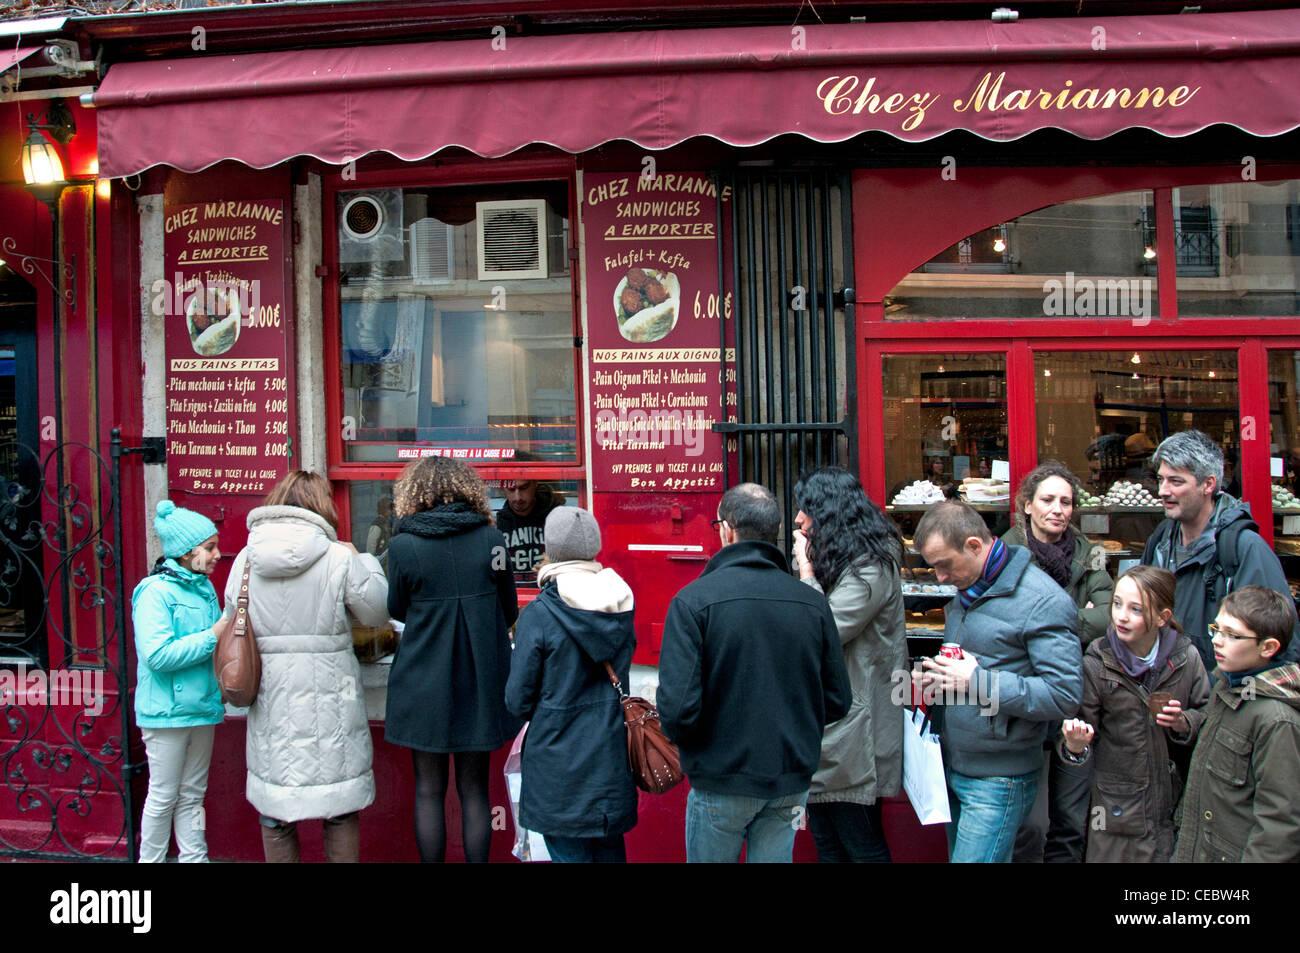 Chez Marianna falafel kefta fast food restaurant Marais Paris France - Stock Image